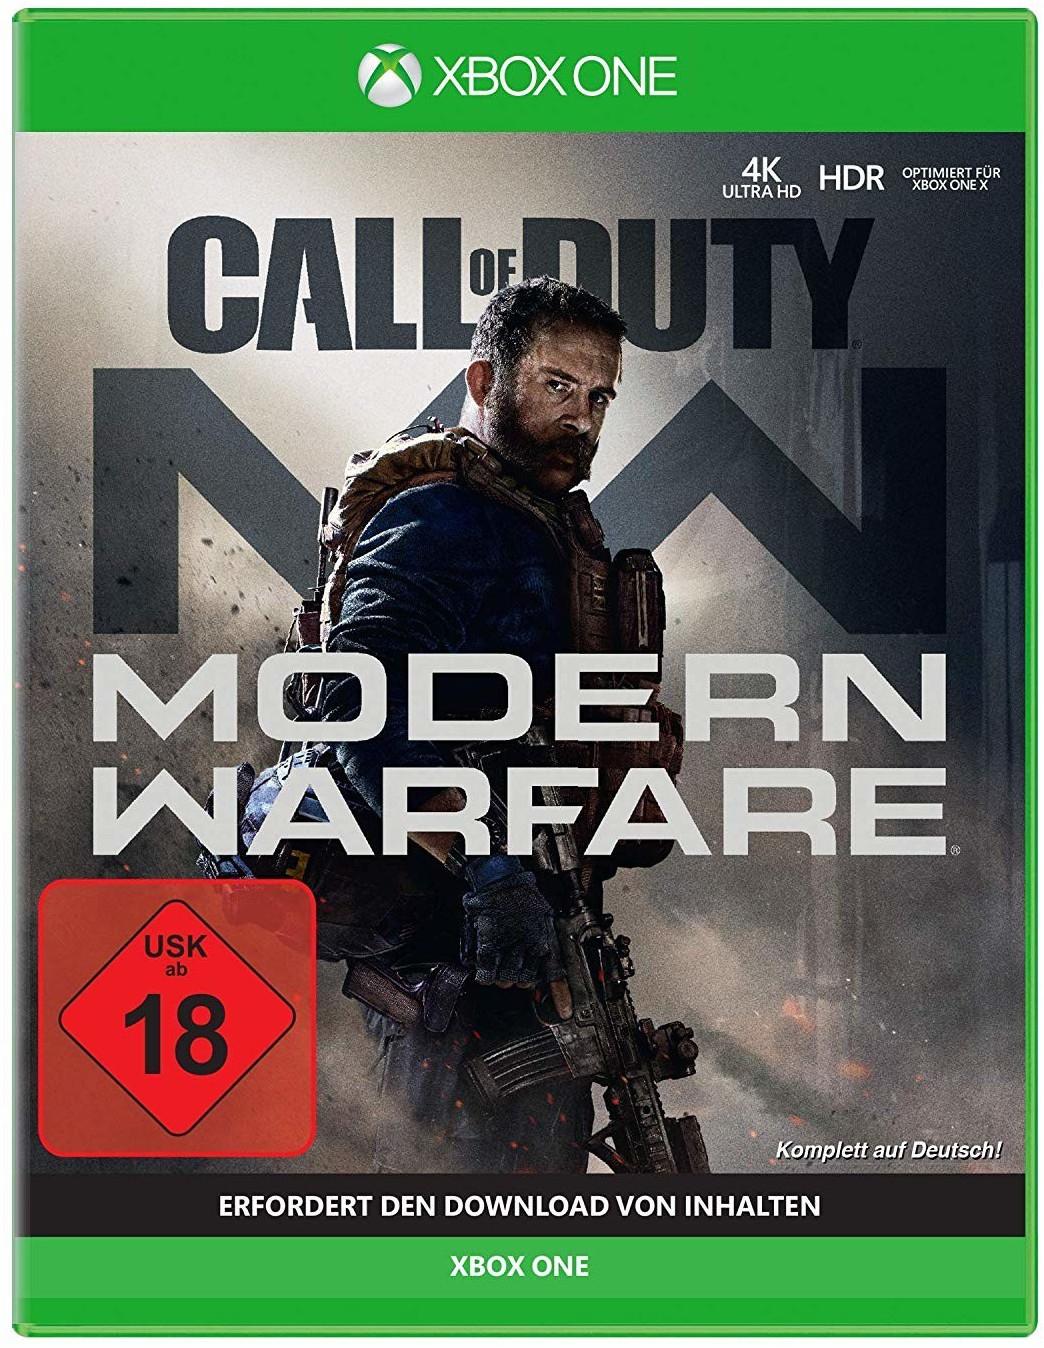 Call of Duty Modern Warfare XBOX One (ggf. Lokal Bonn)